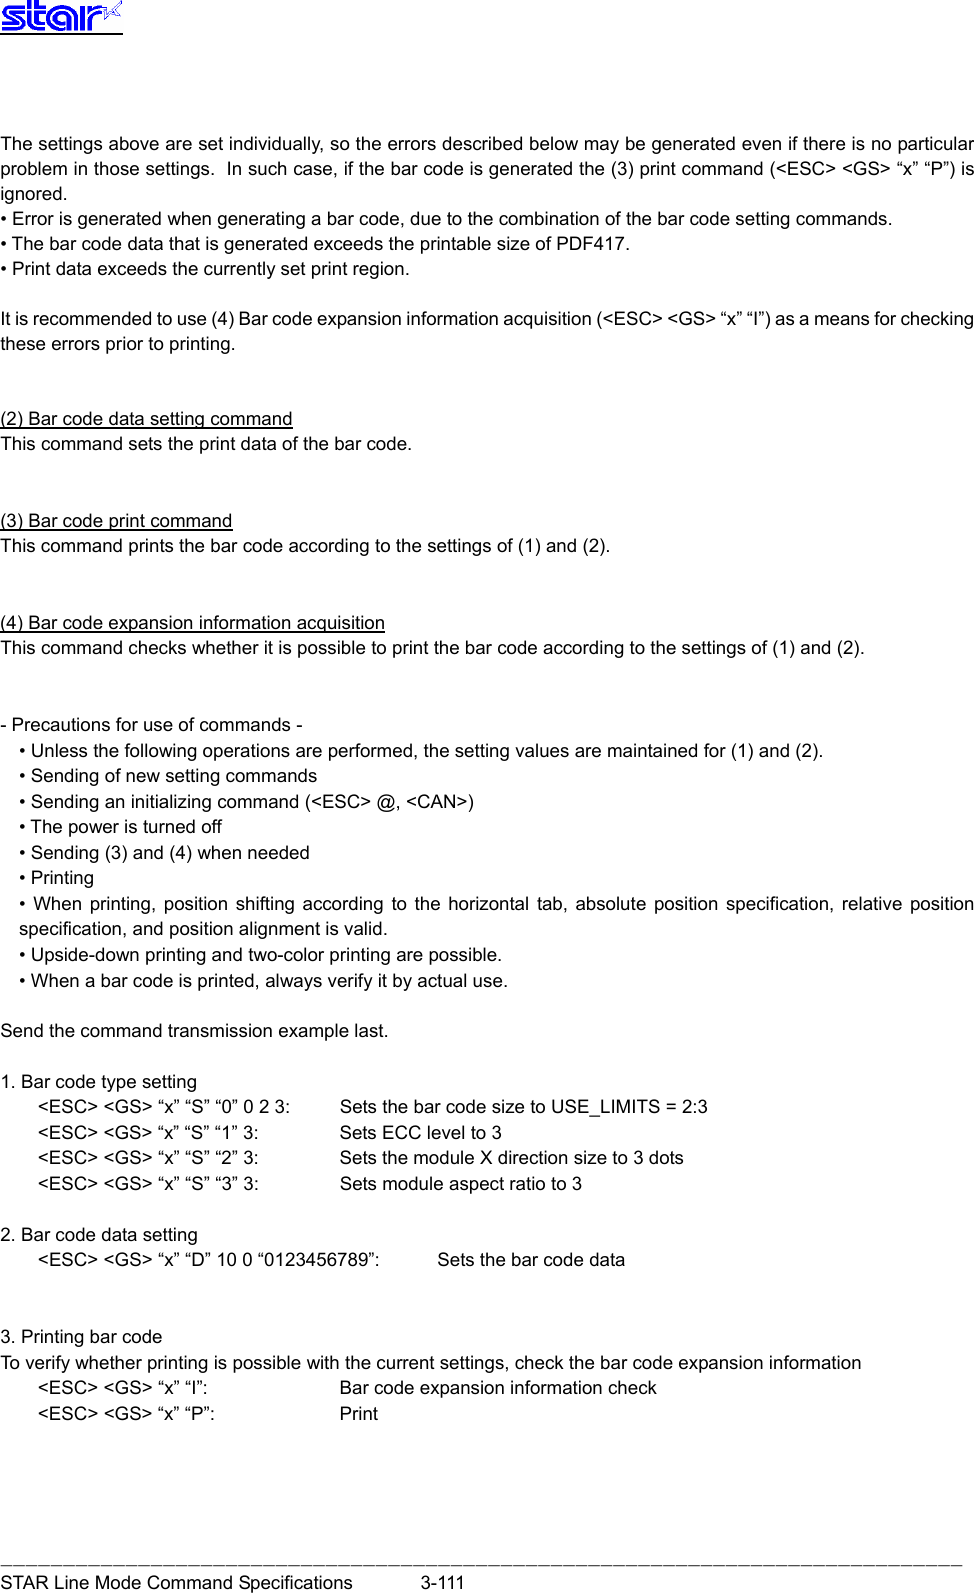 Star Micronics Line Thermal Printer Users Manual Mode Commond